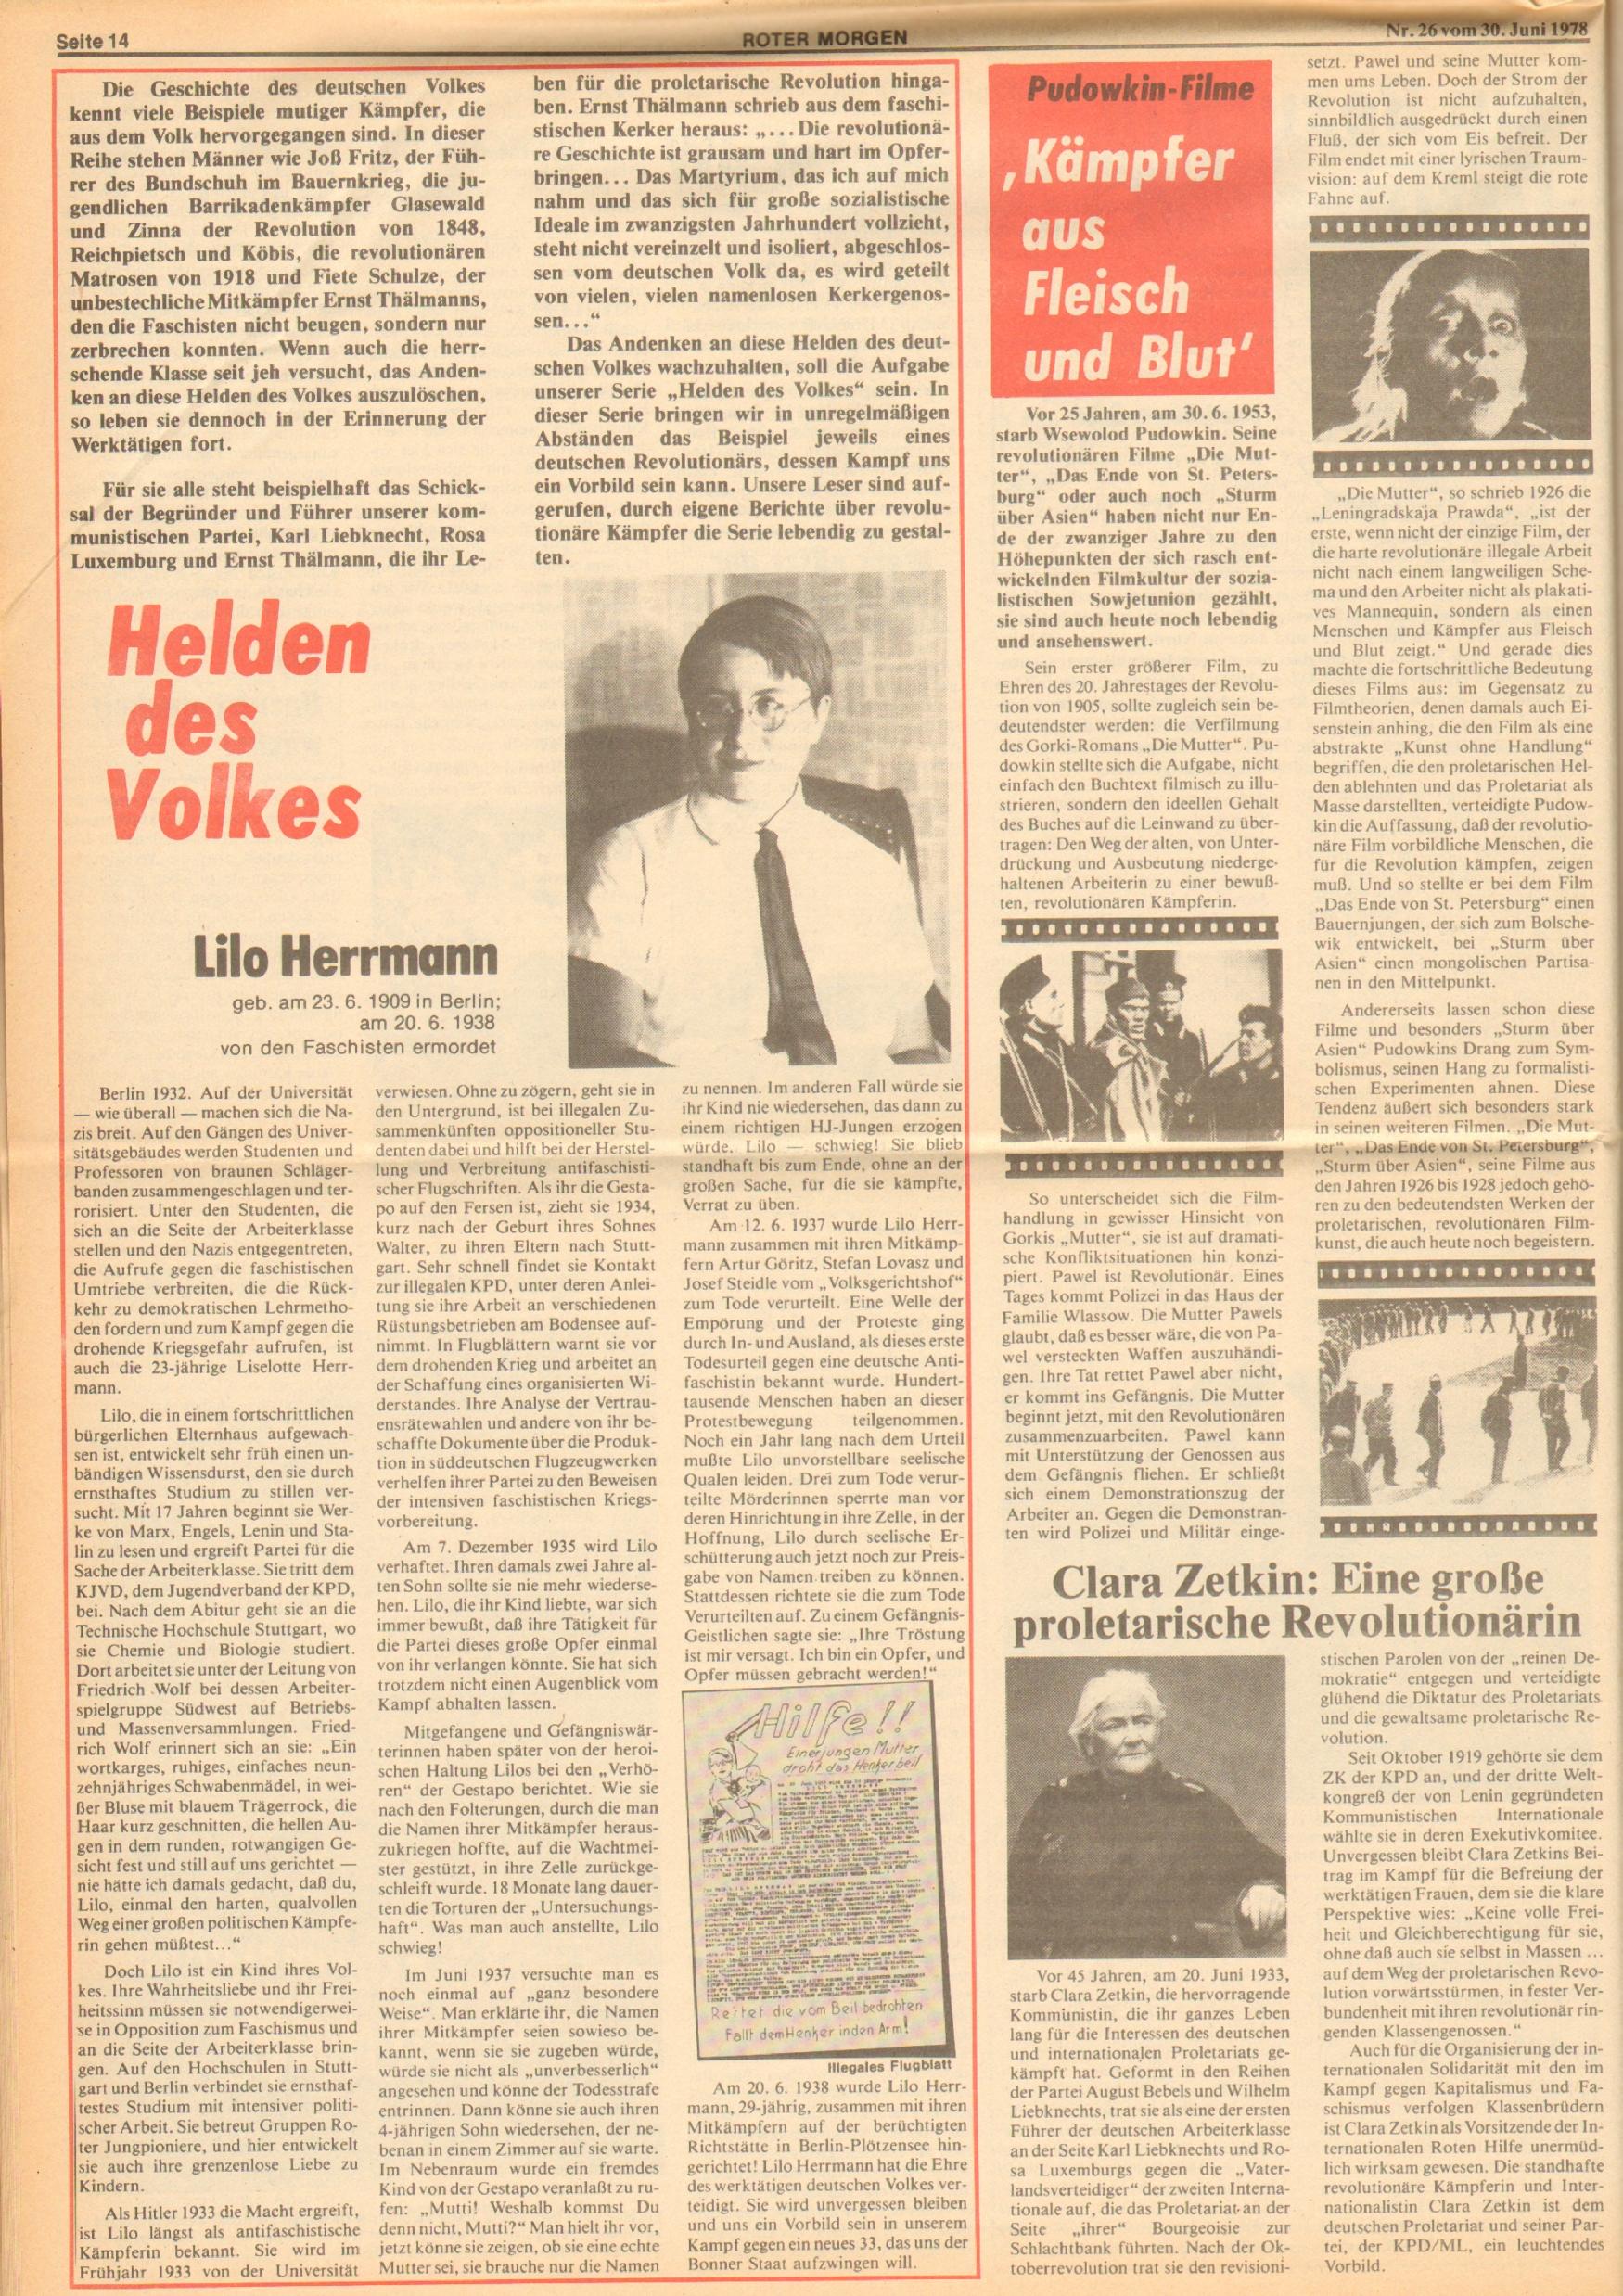 Roter Morgen, 12. Jg., 30. Juni 1978, Nr. 26, Seite 14